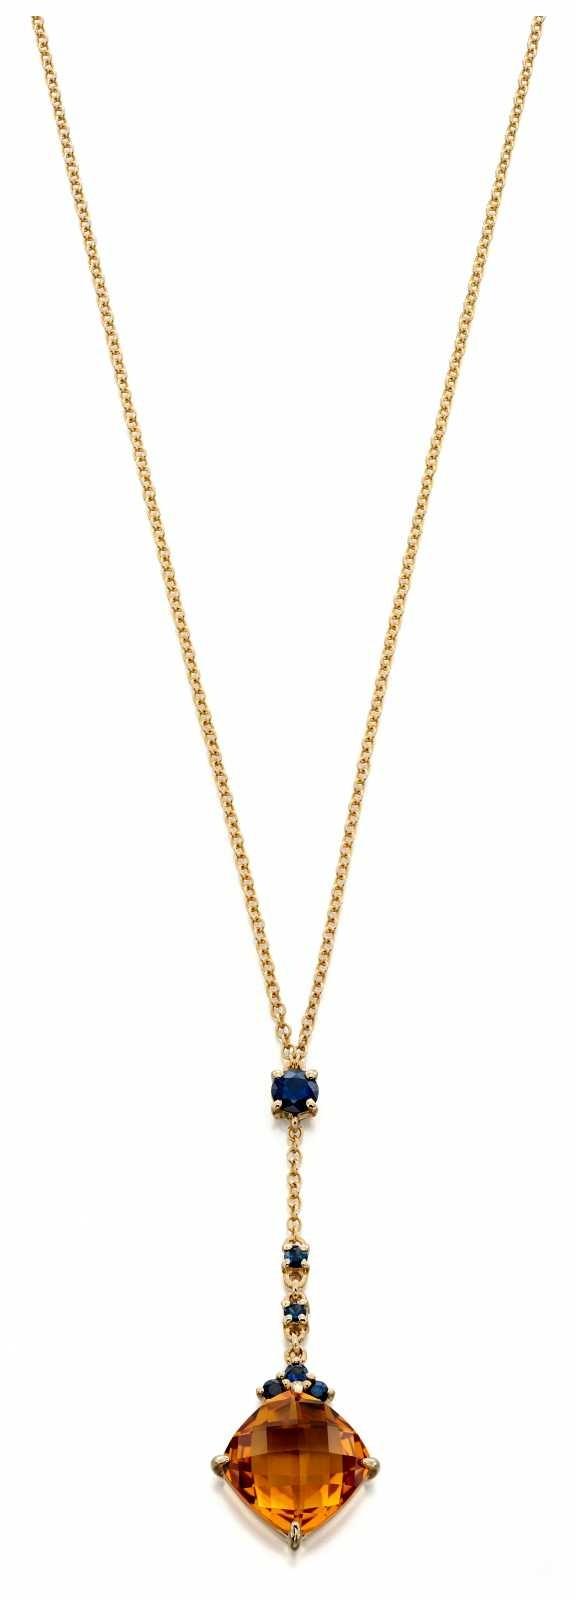 Fiorelli Gold 9k Yellow Gold Citrine Sapphire Necklace 41 – 46 cm GN269